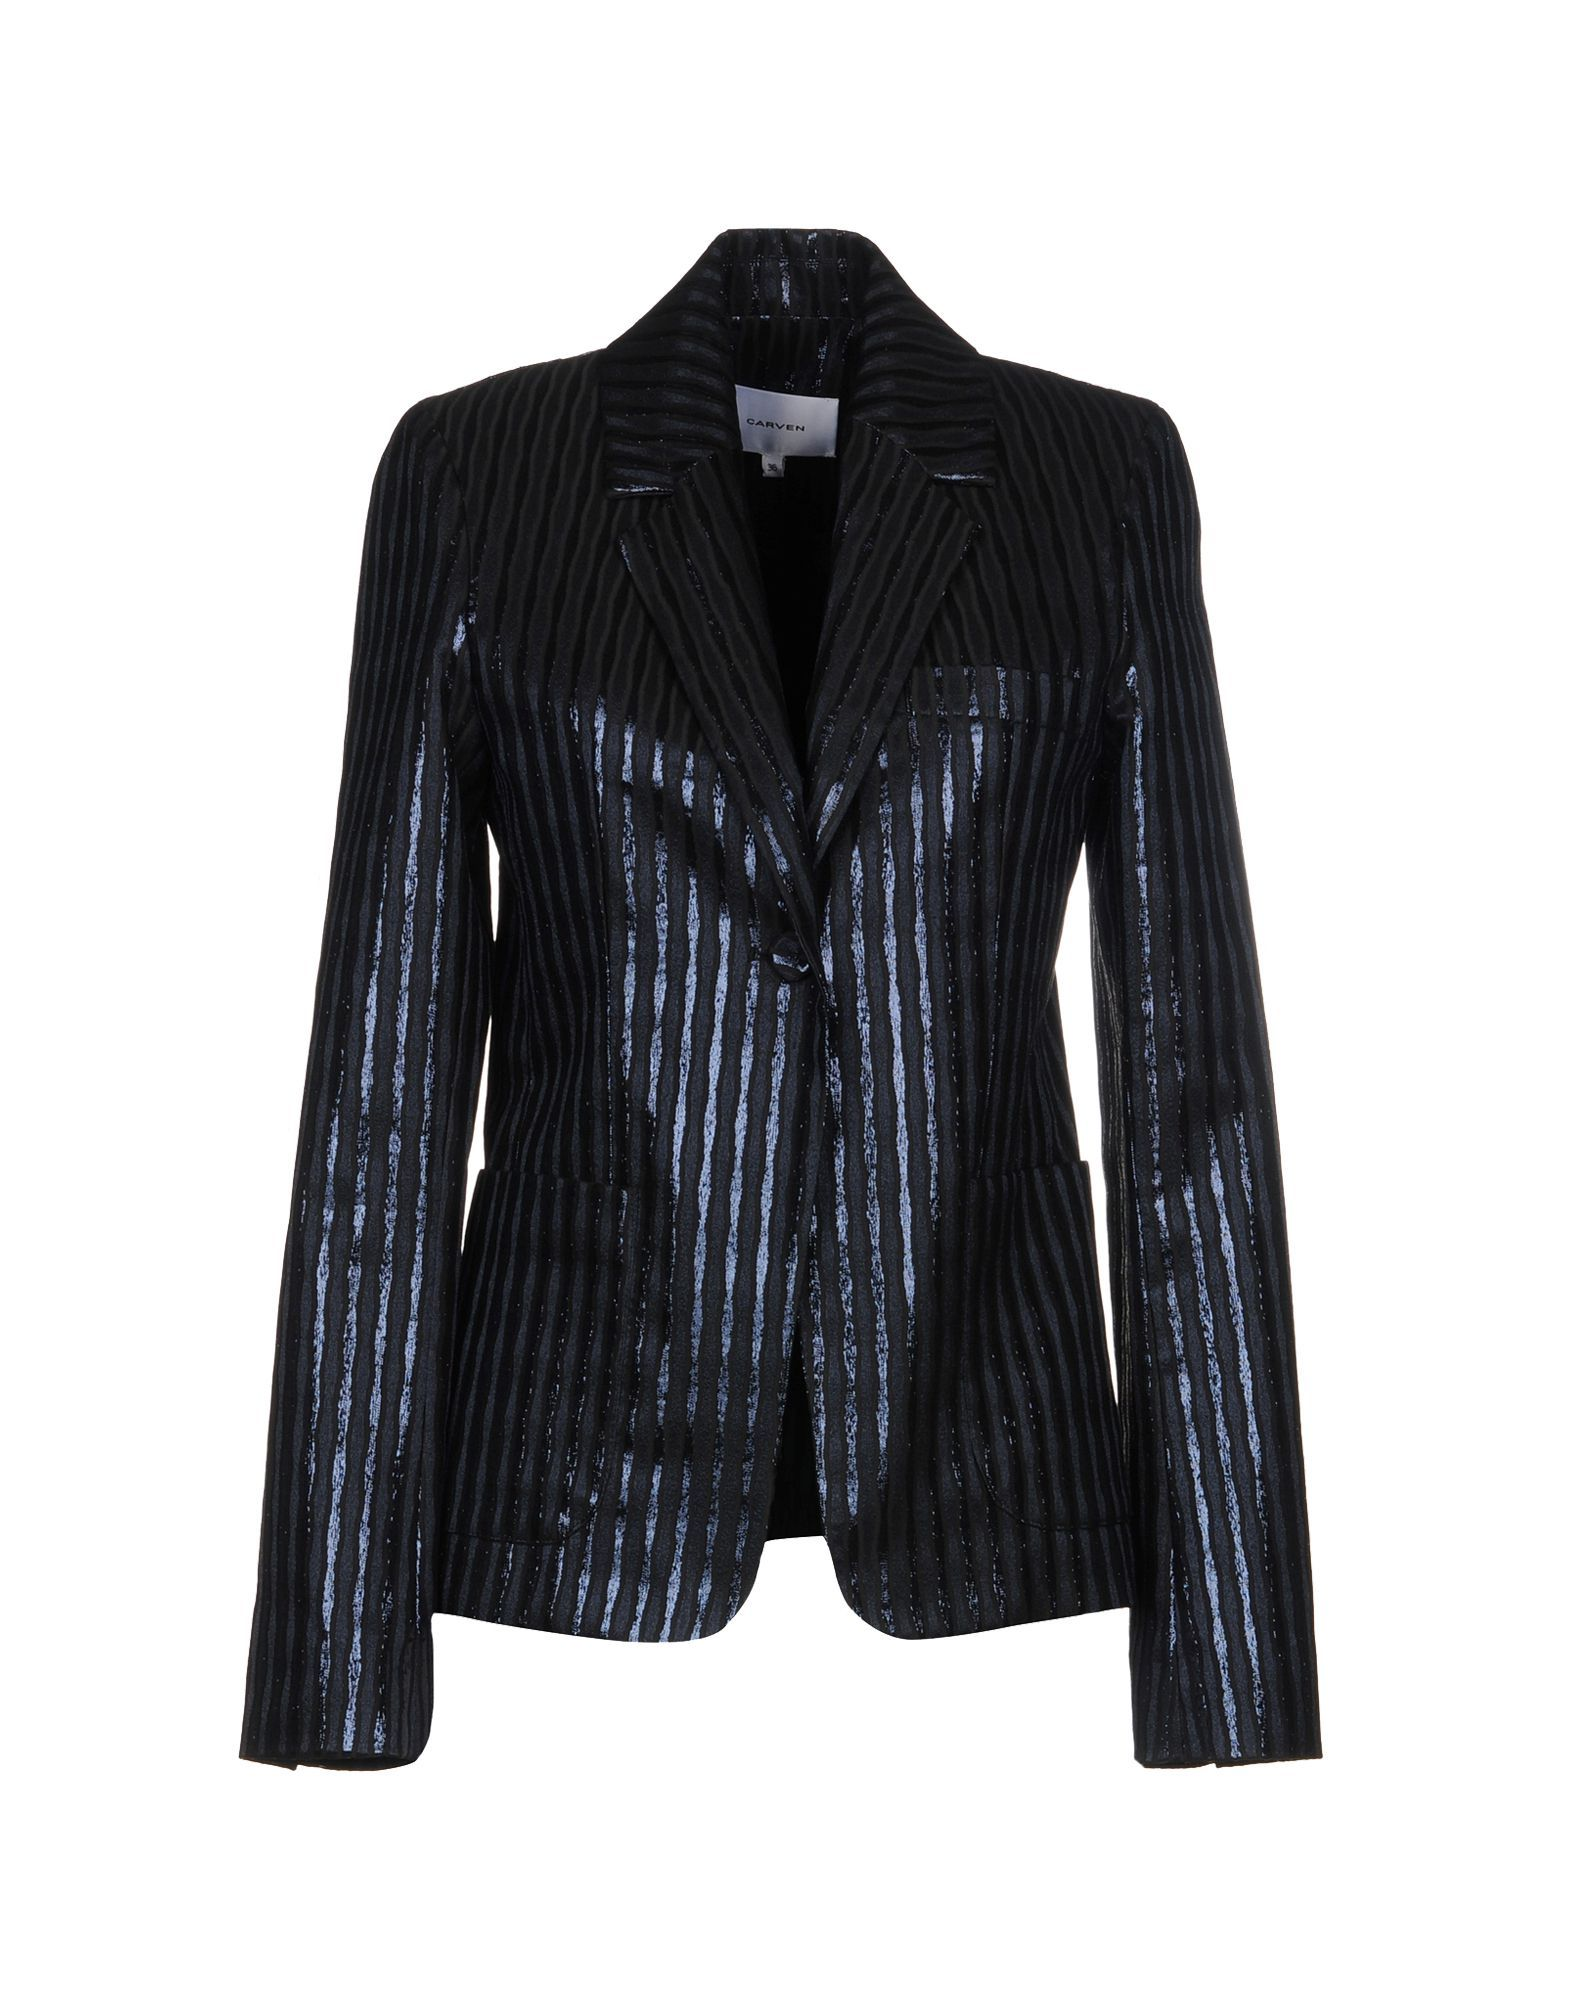 Carven Dark Blue Lame Single Breasted Jacket